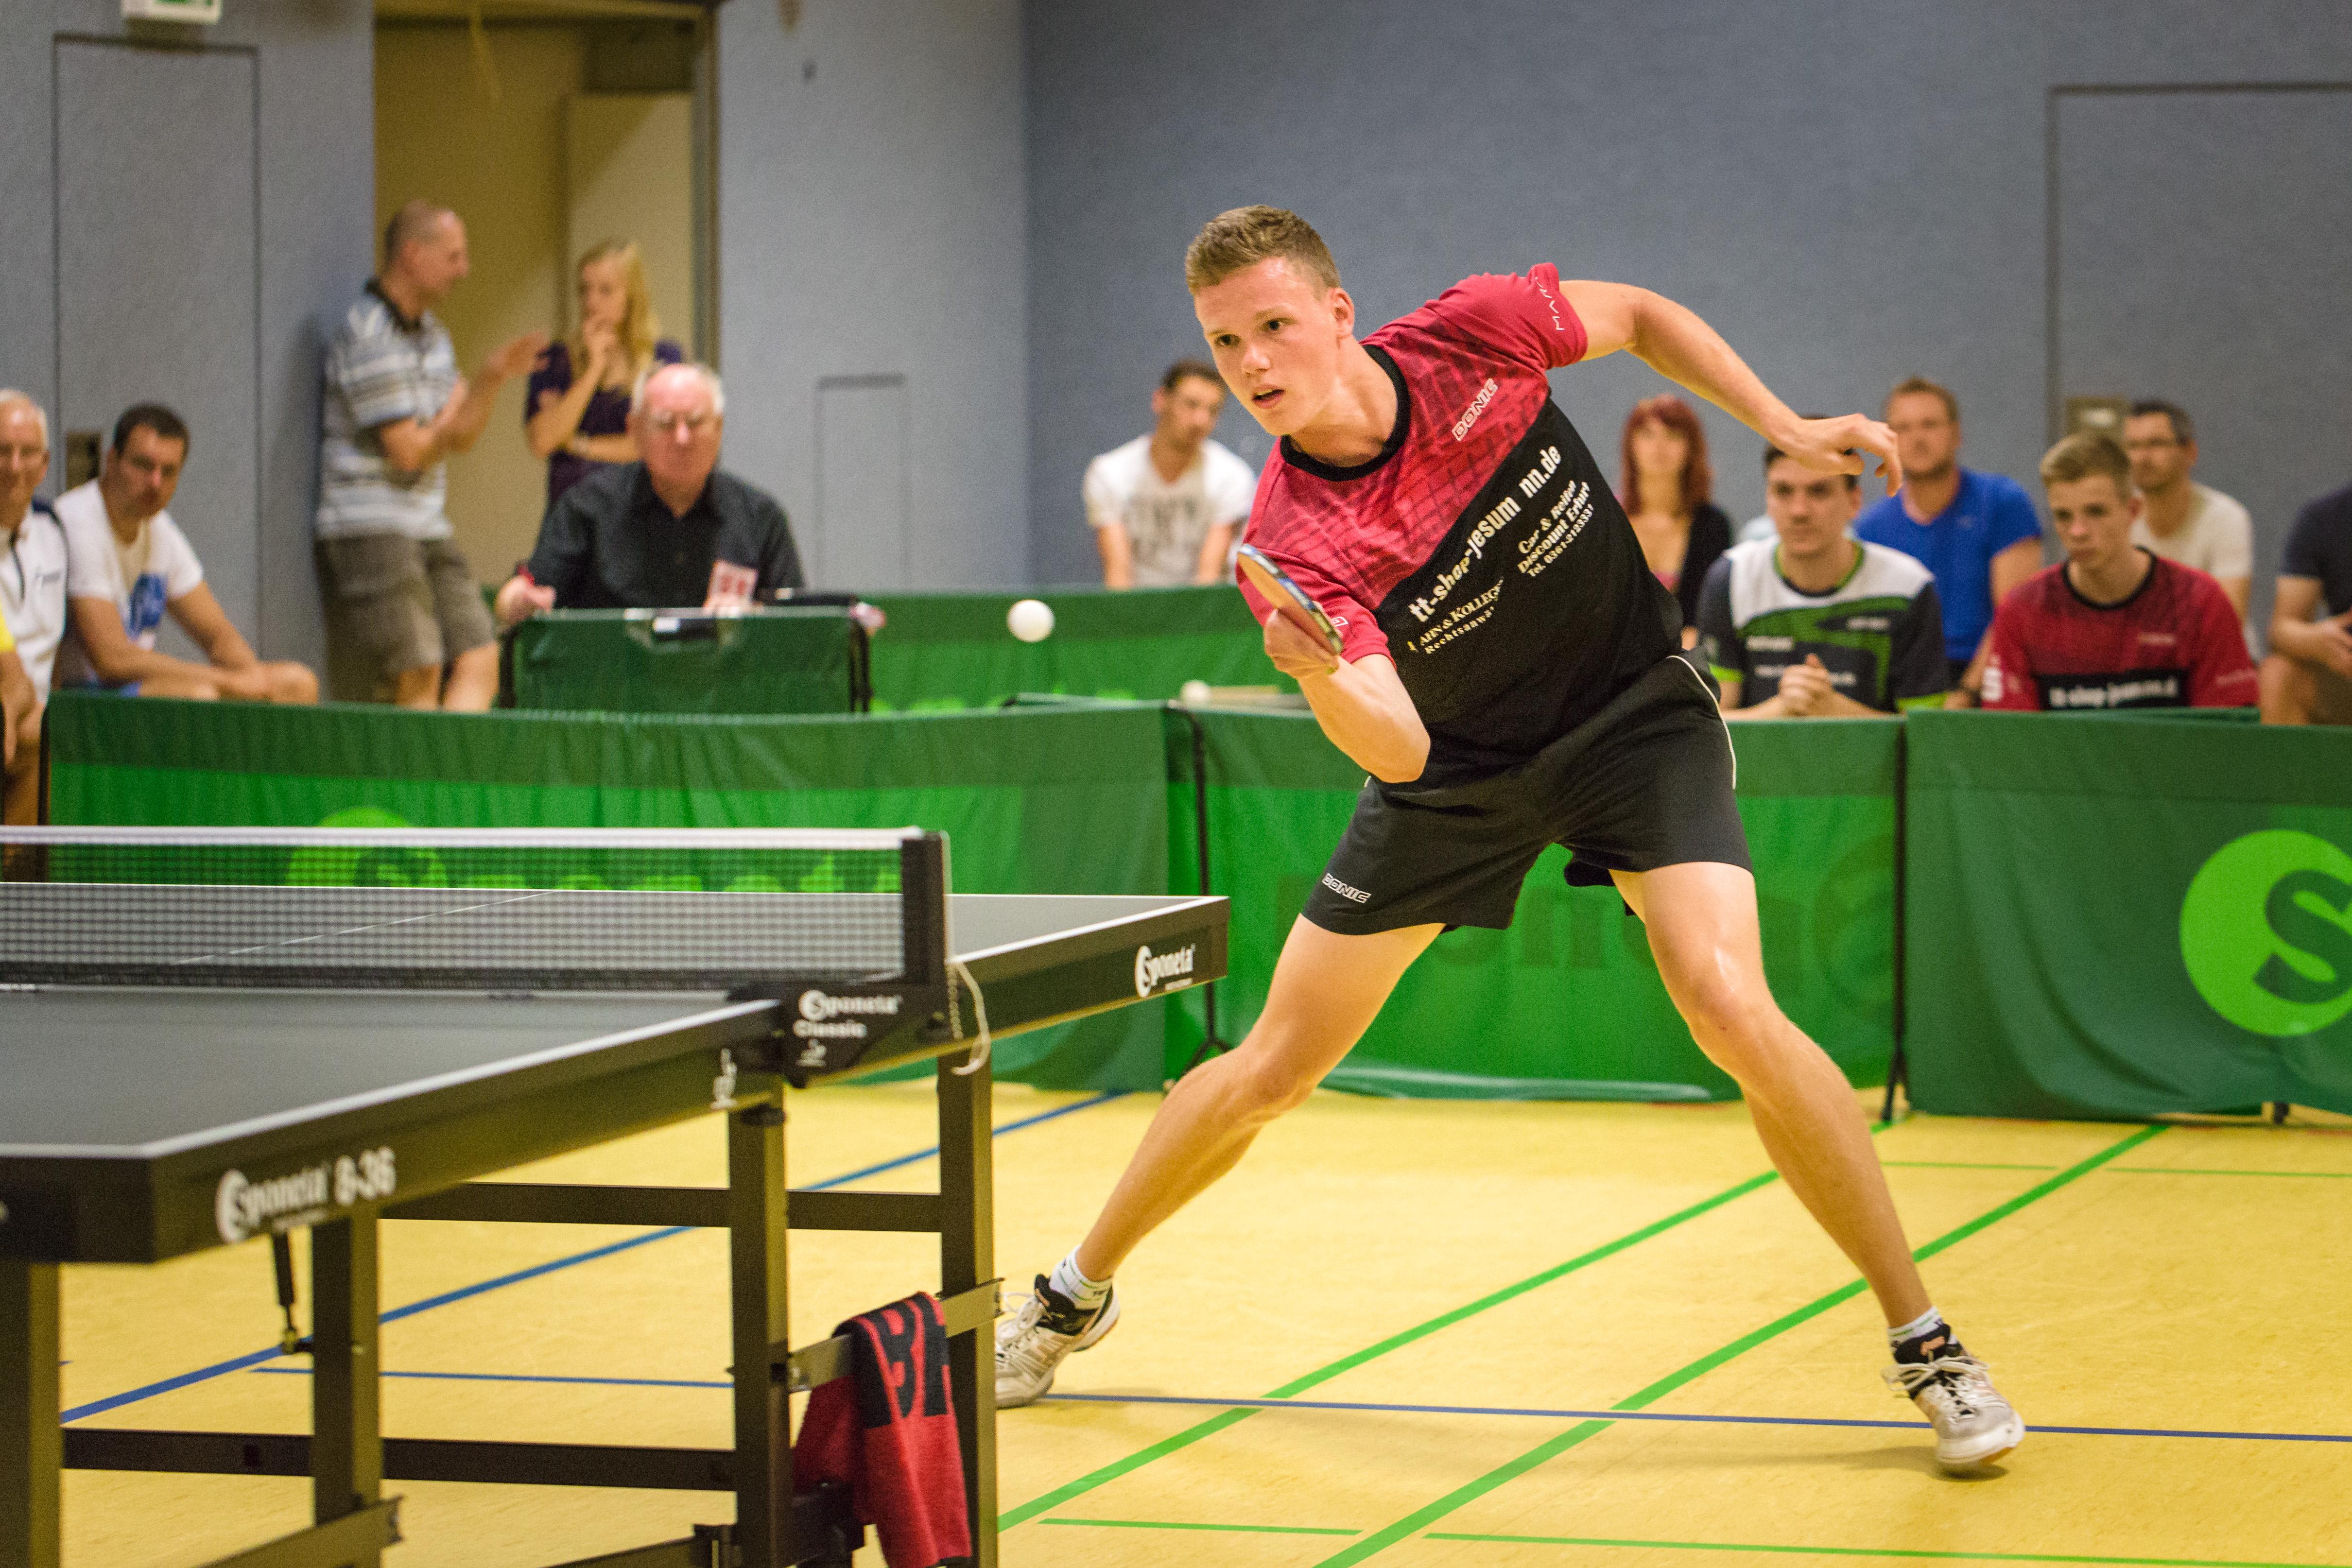 Erfurt kann auch Tischtennis!